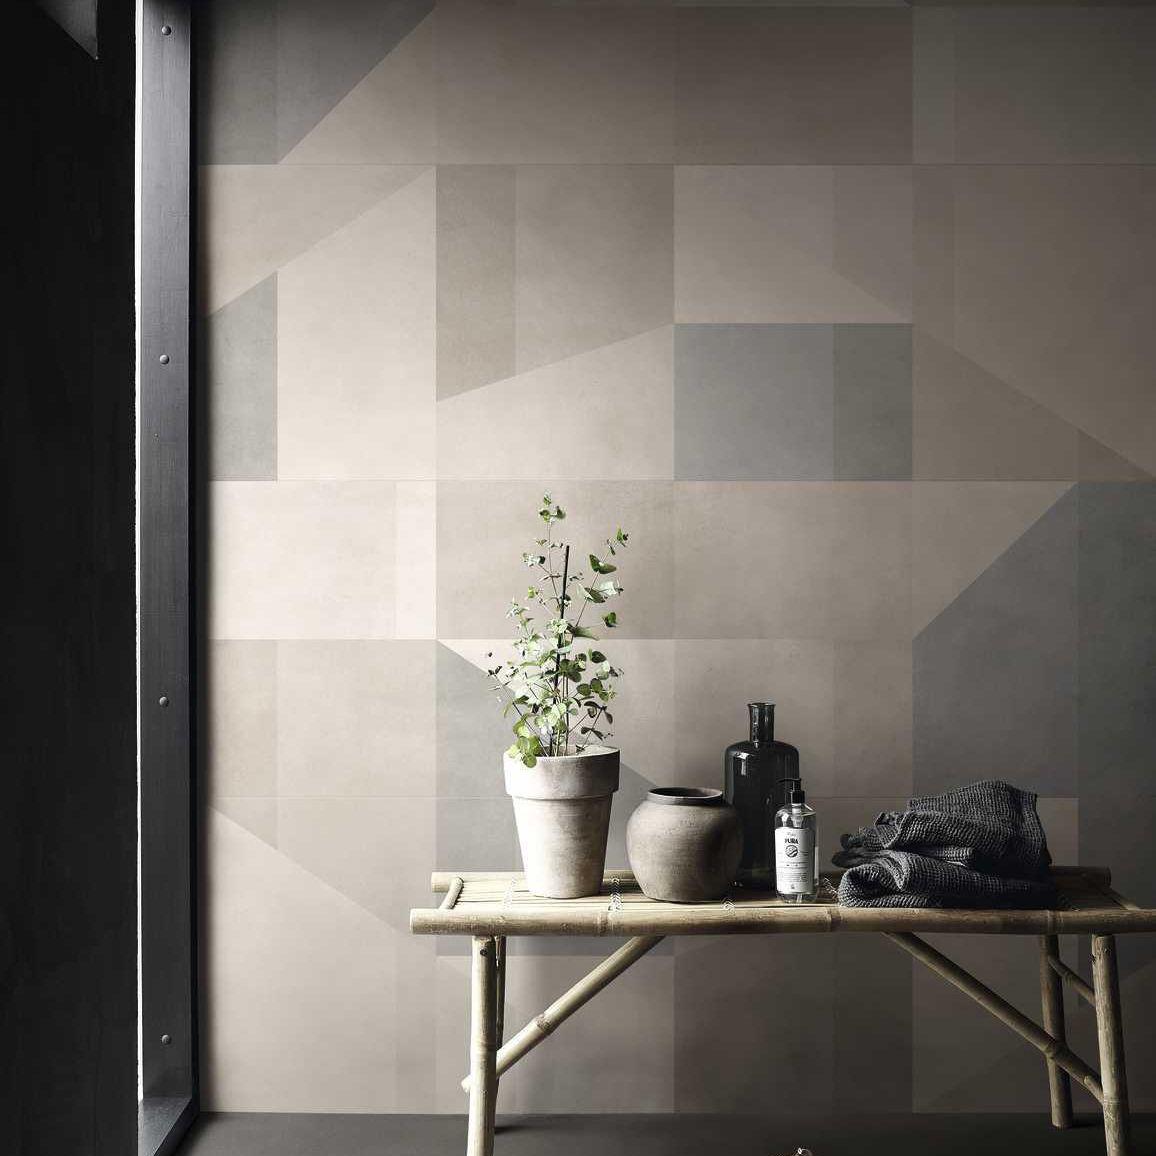 Indoor Tile Alchimia Marazzi Wall Porcelain Stoneware